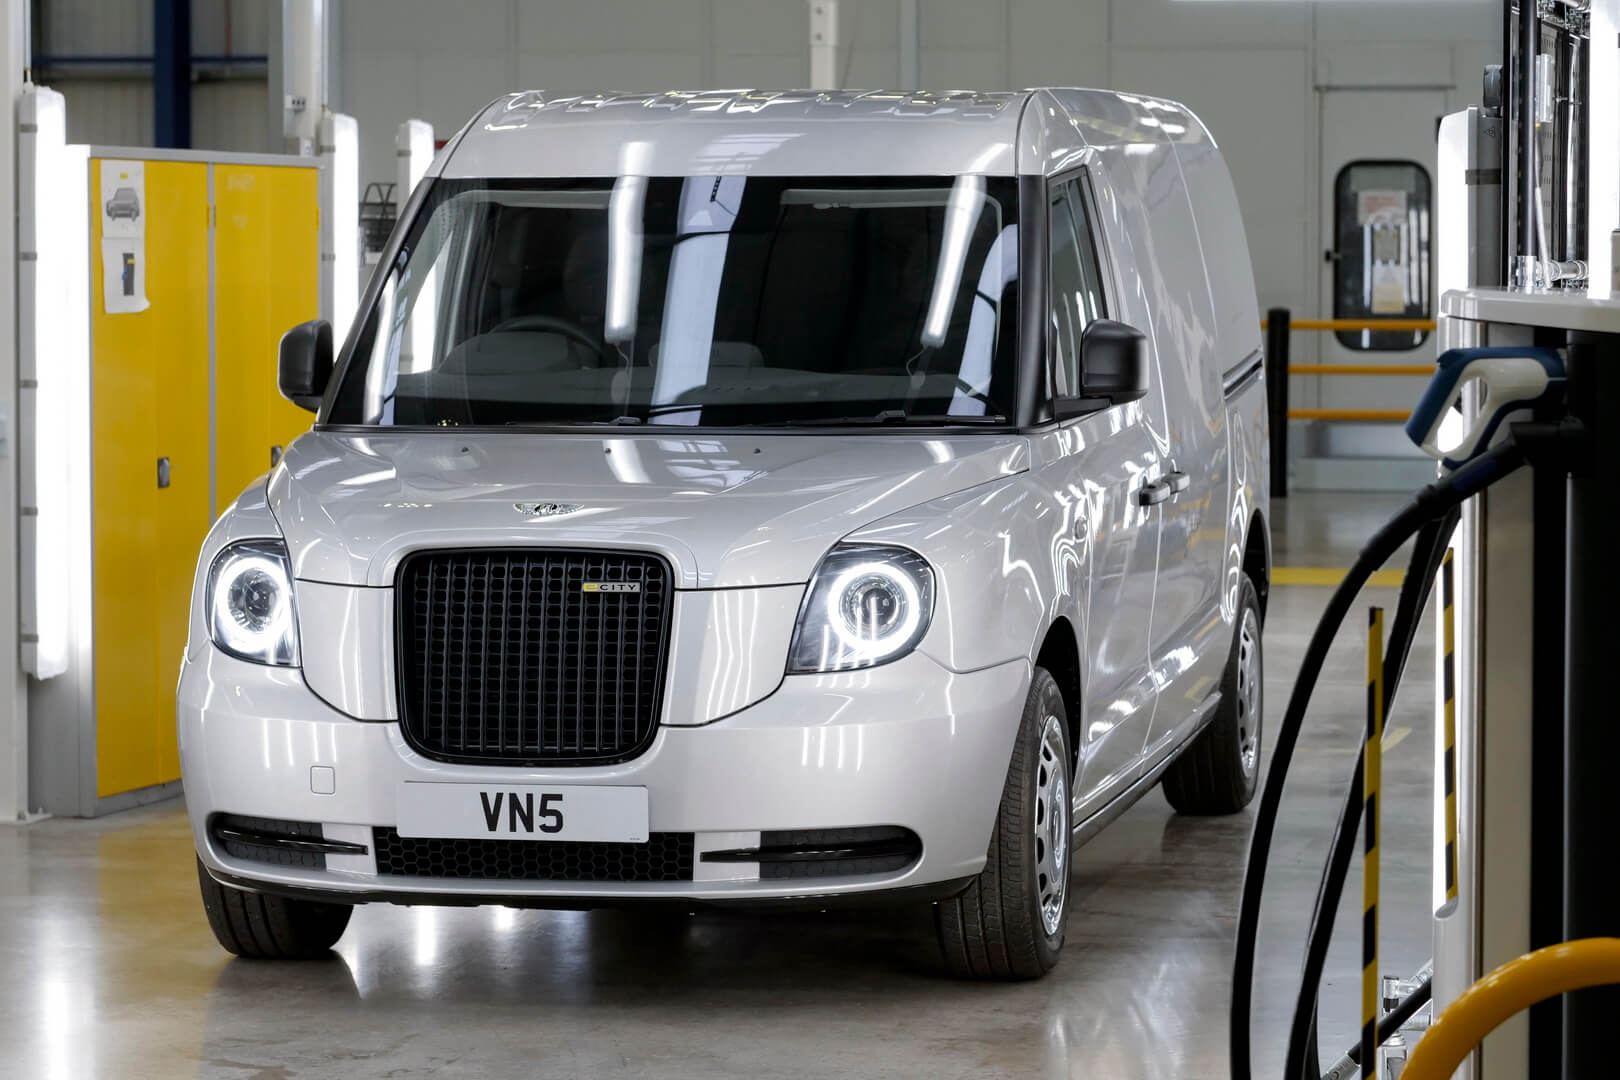 Электрифицированный фургон LEVC VN5